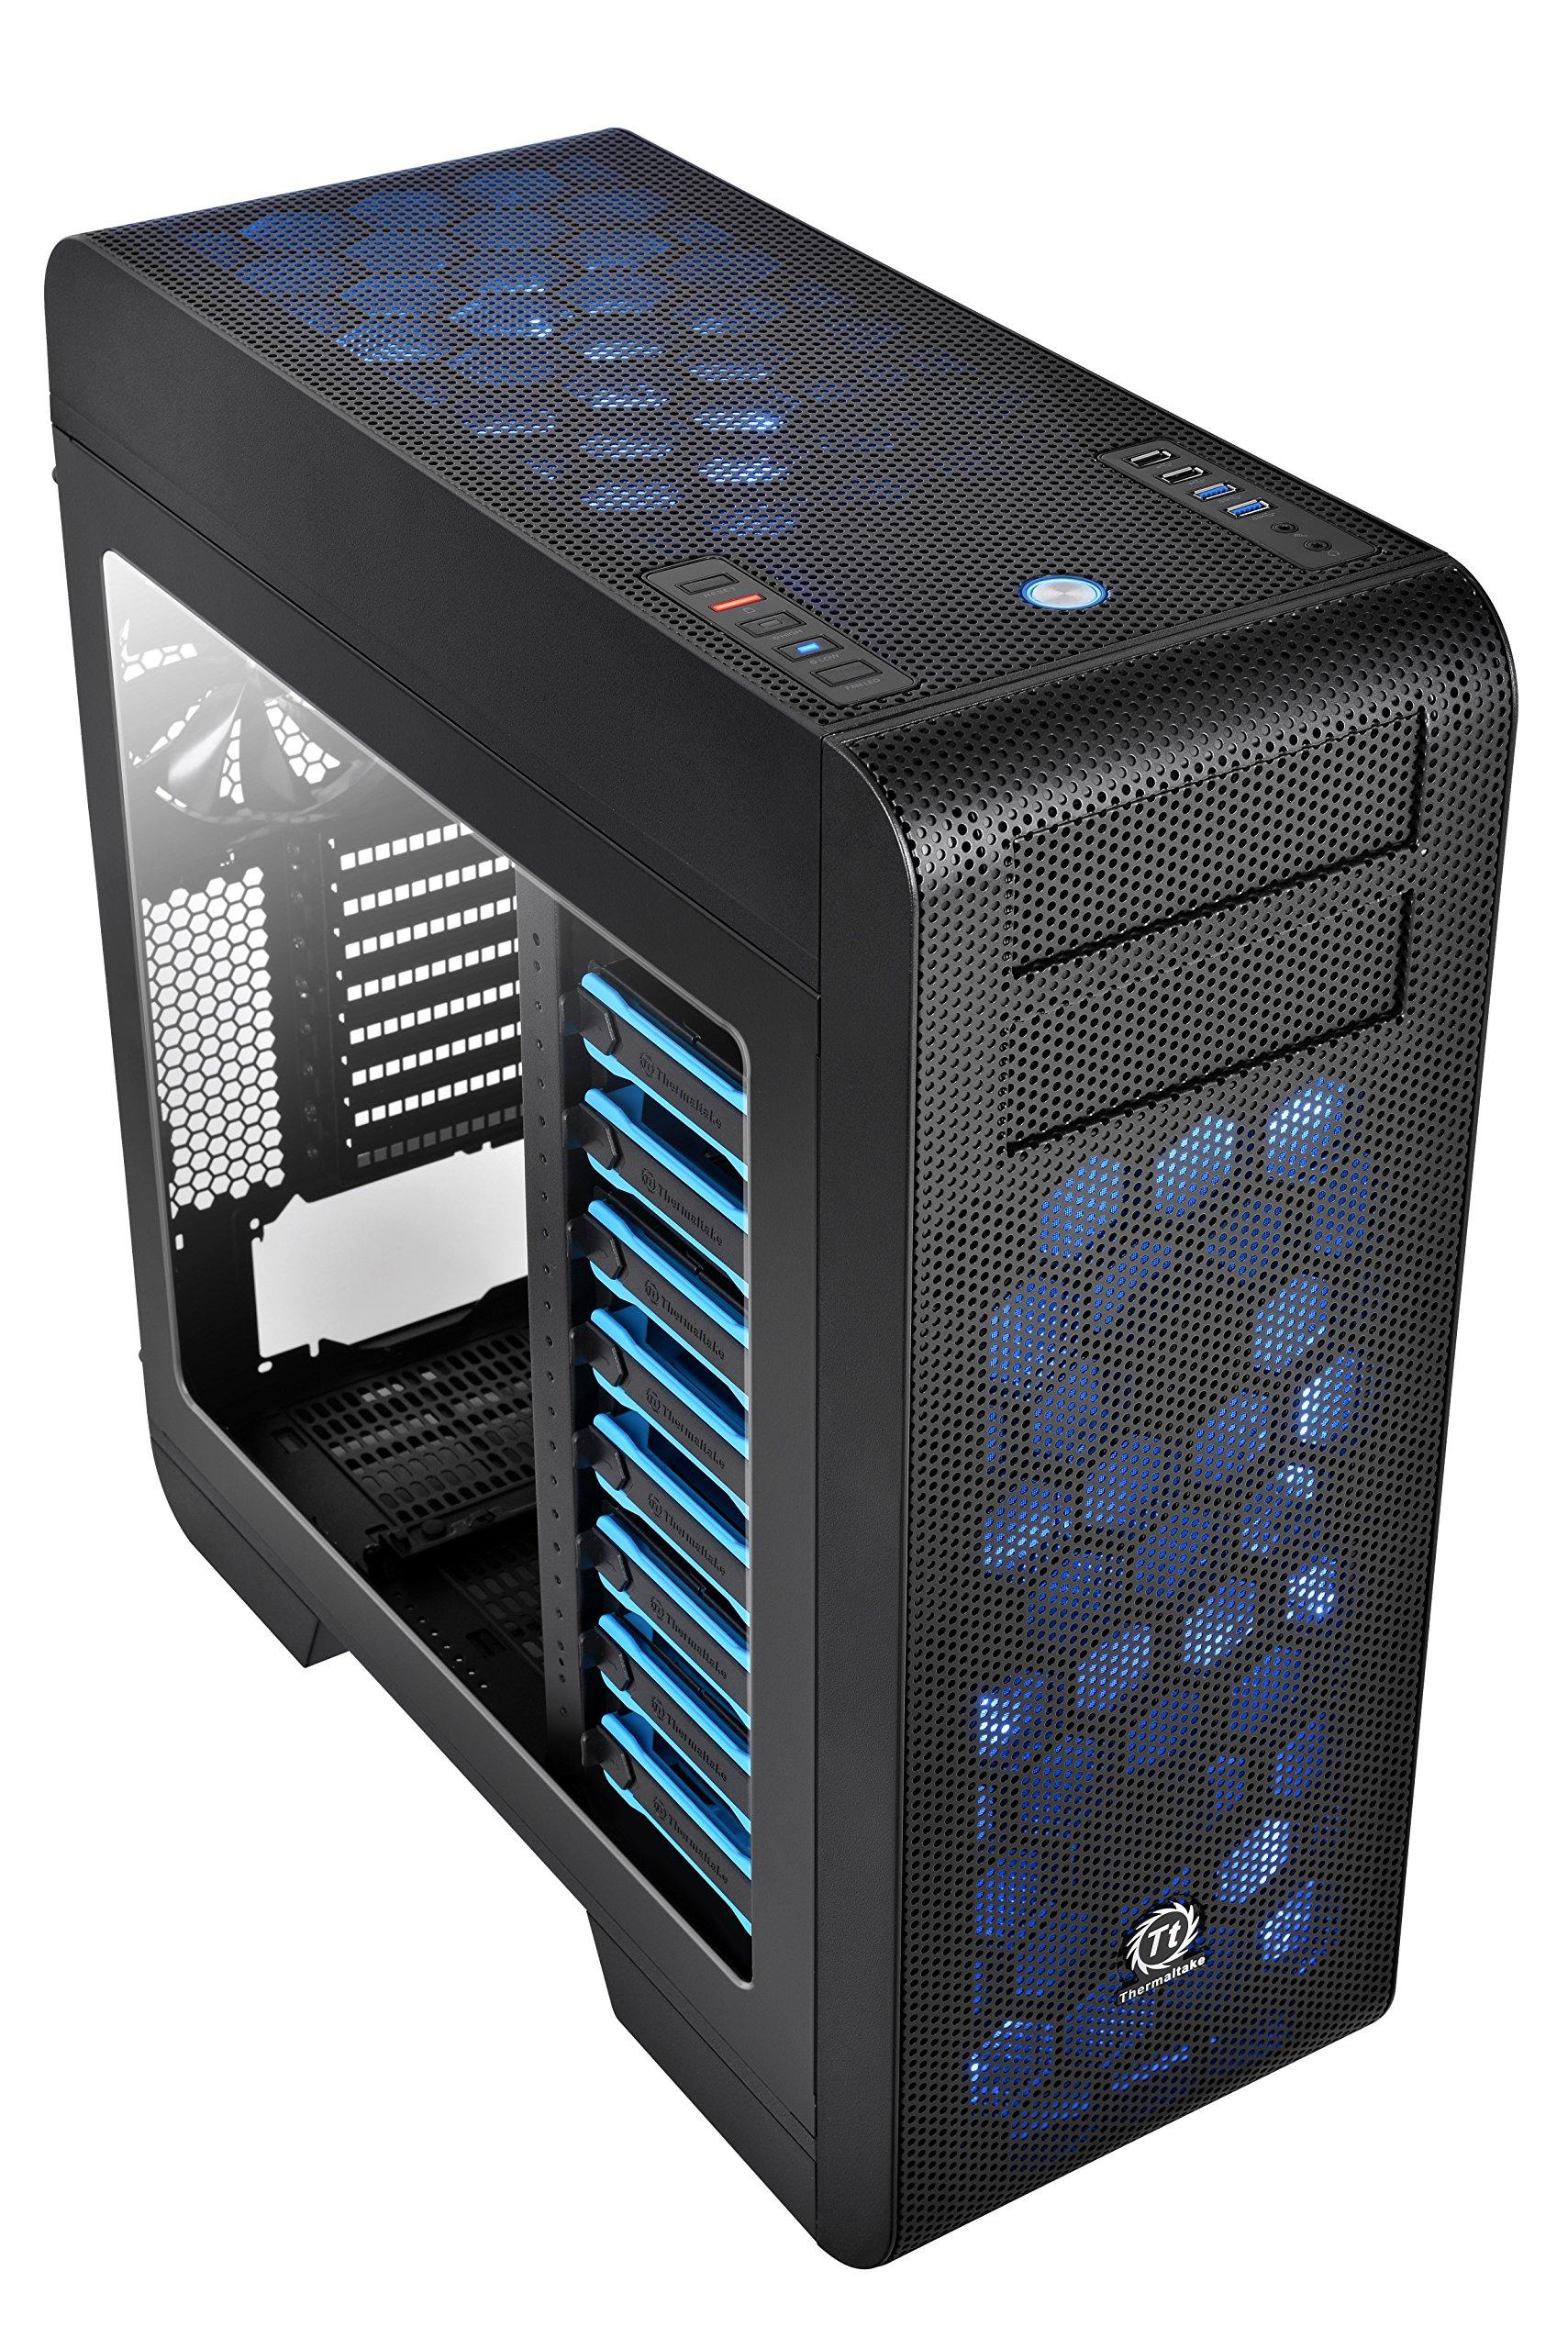 Thermaltake Core V71  E-ATX Full Tower Gaming Computer Case CA-1B6-00F1WN-00